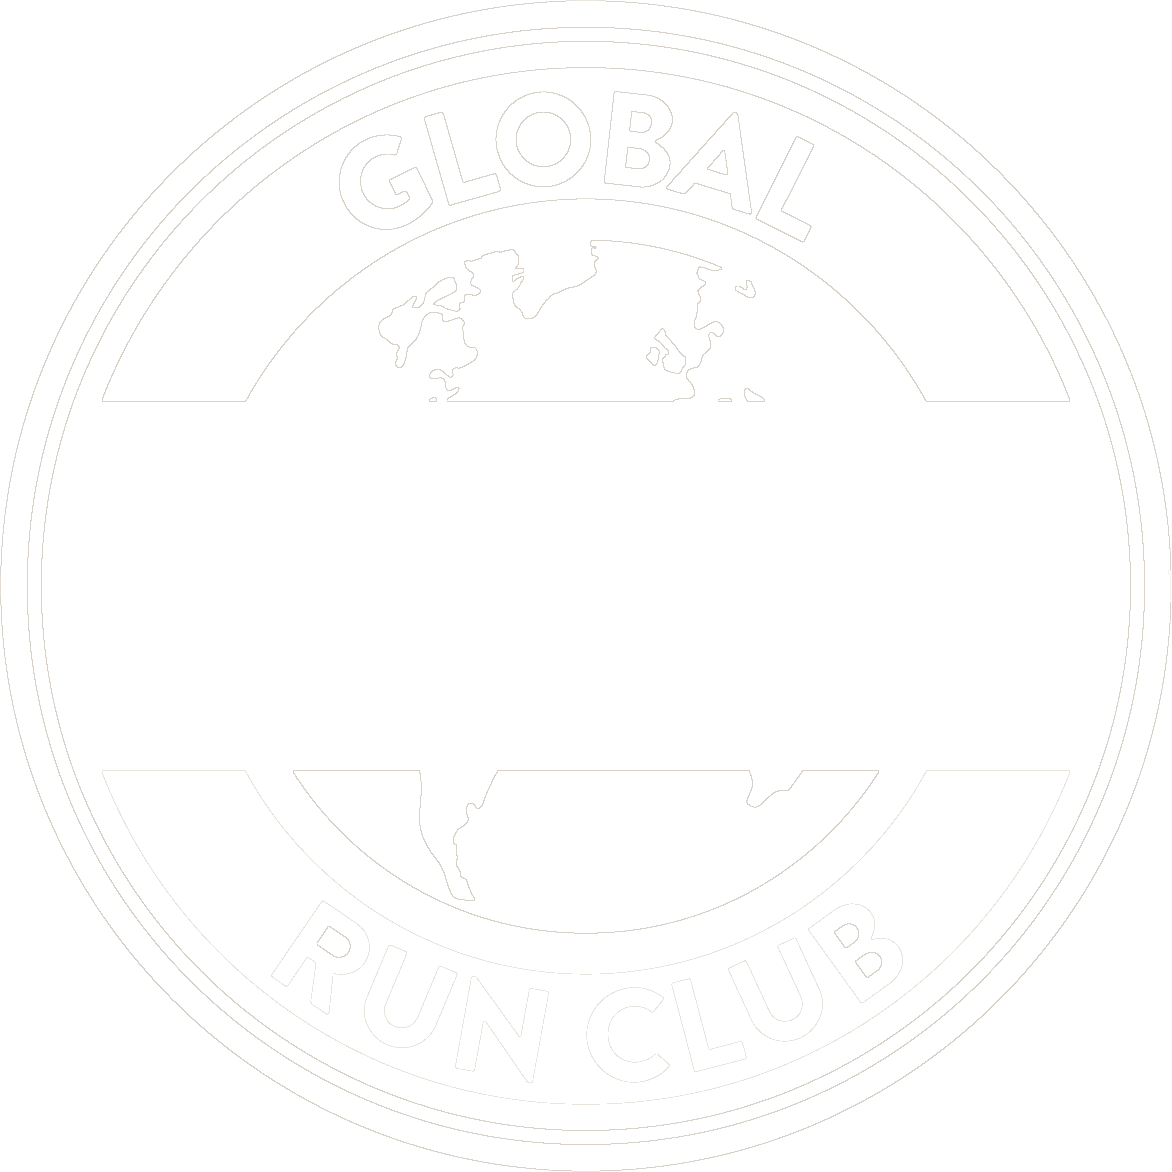 Global Rub Club Logo